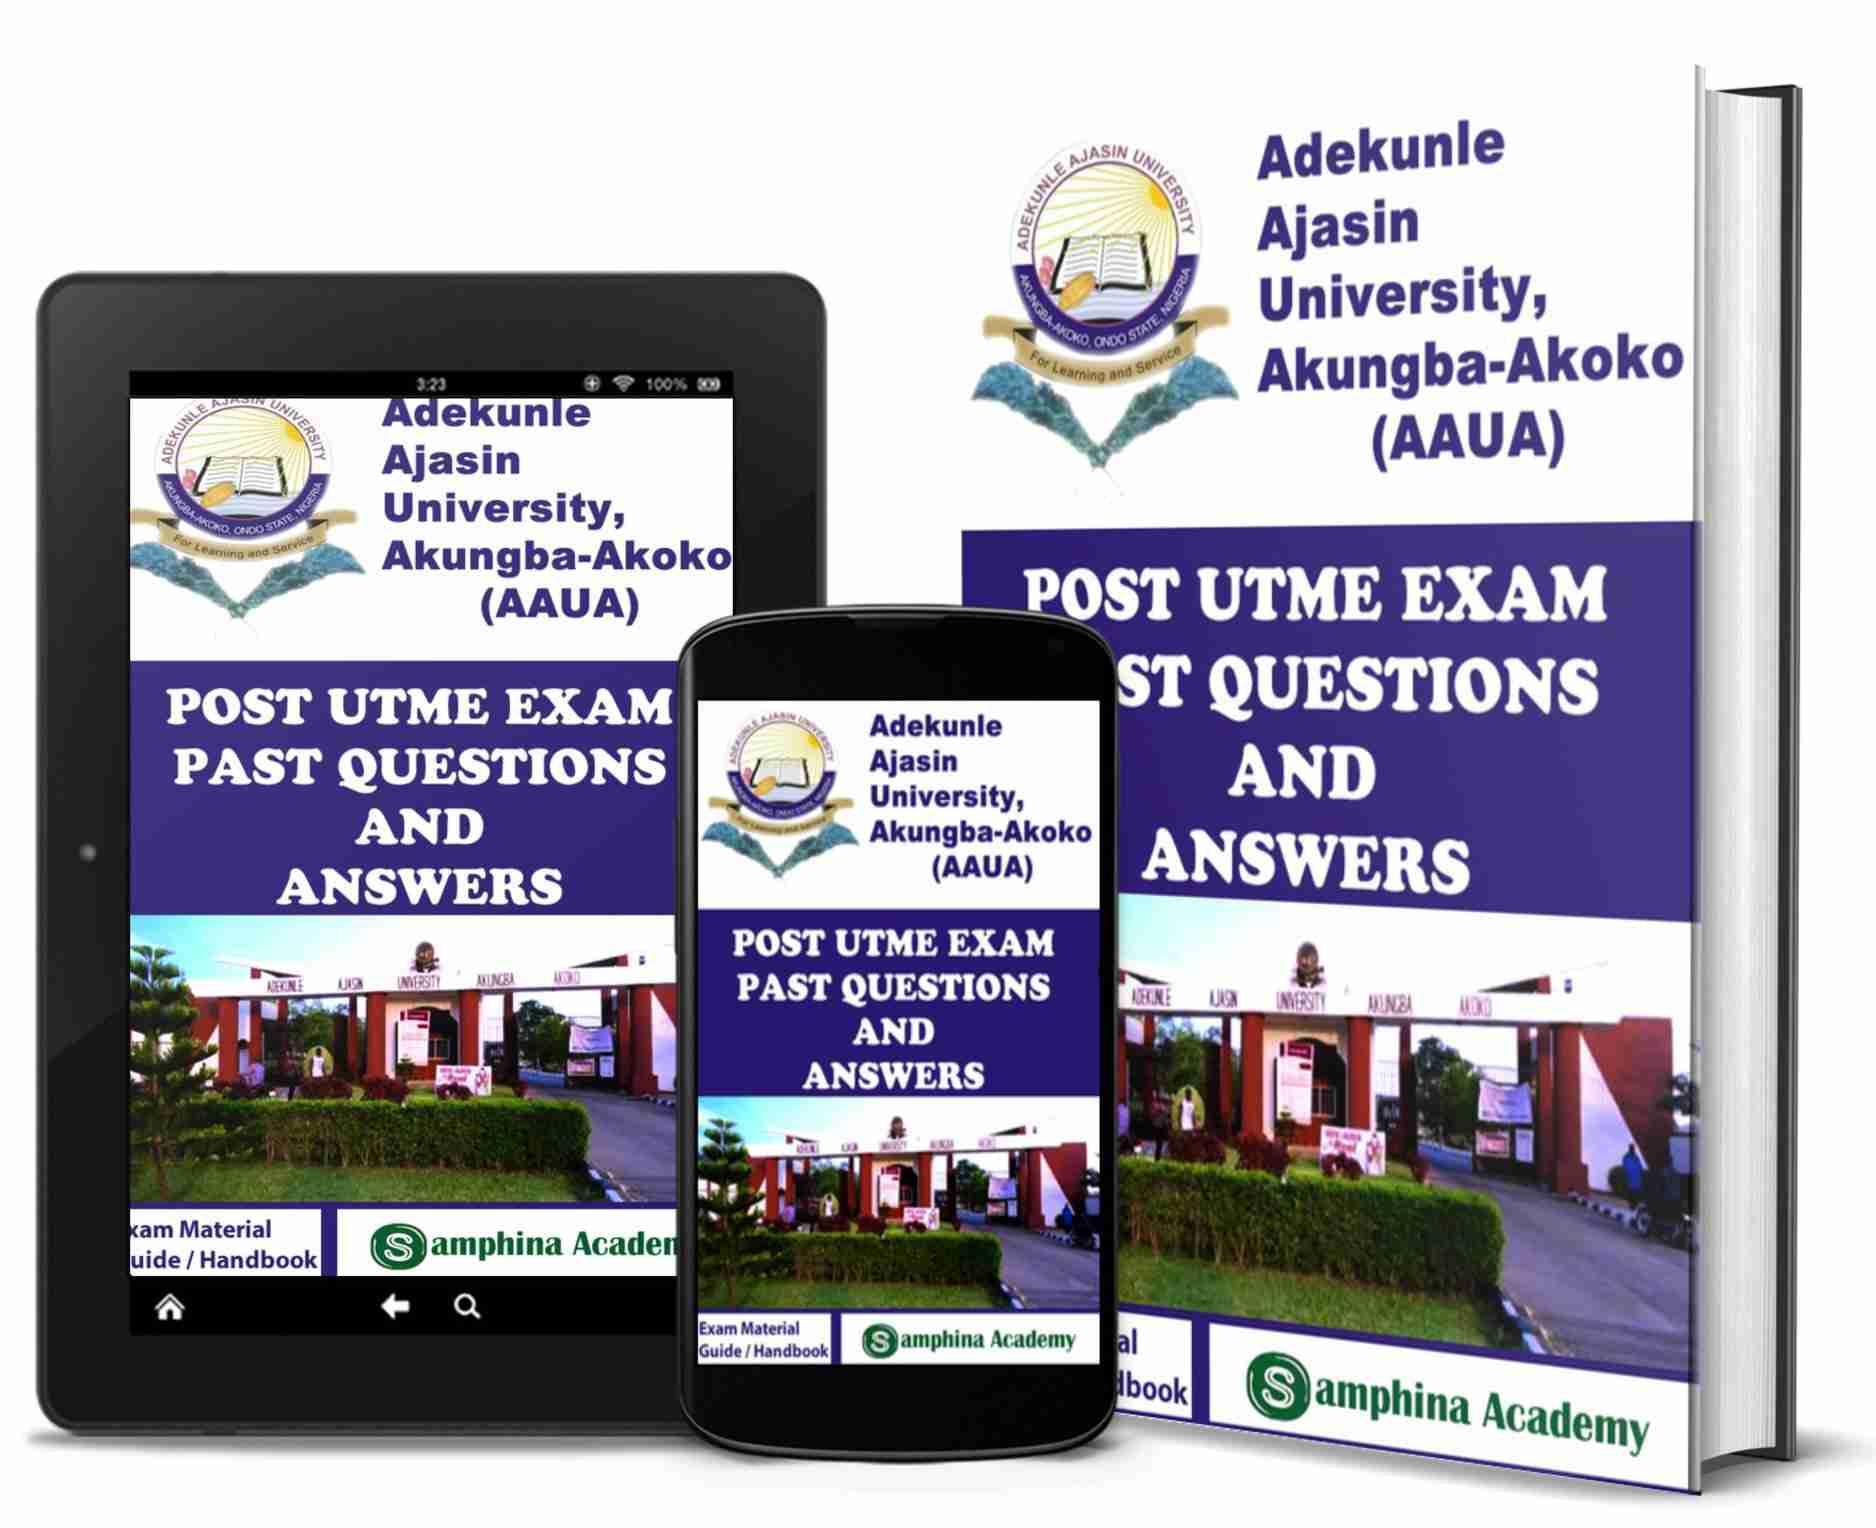 Adekunle Ajasin University, Akungba-Akoko - AAUA Post UTME Past Questions and Answers